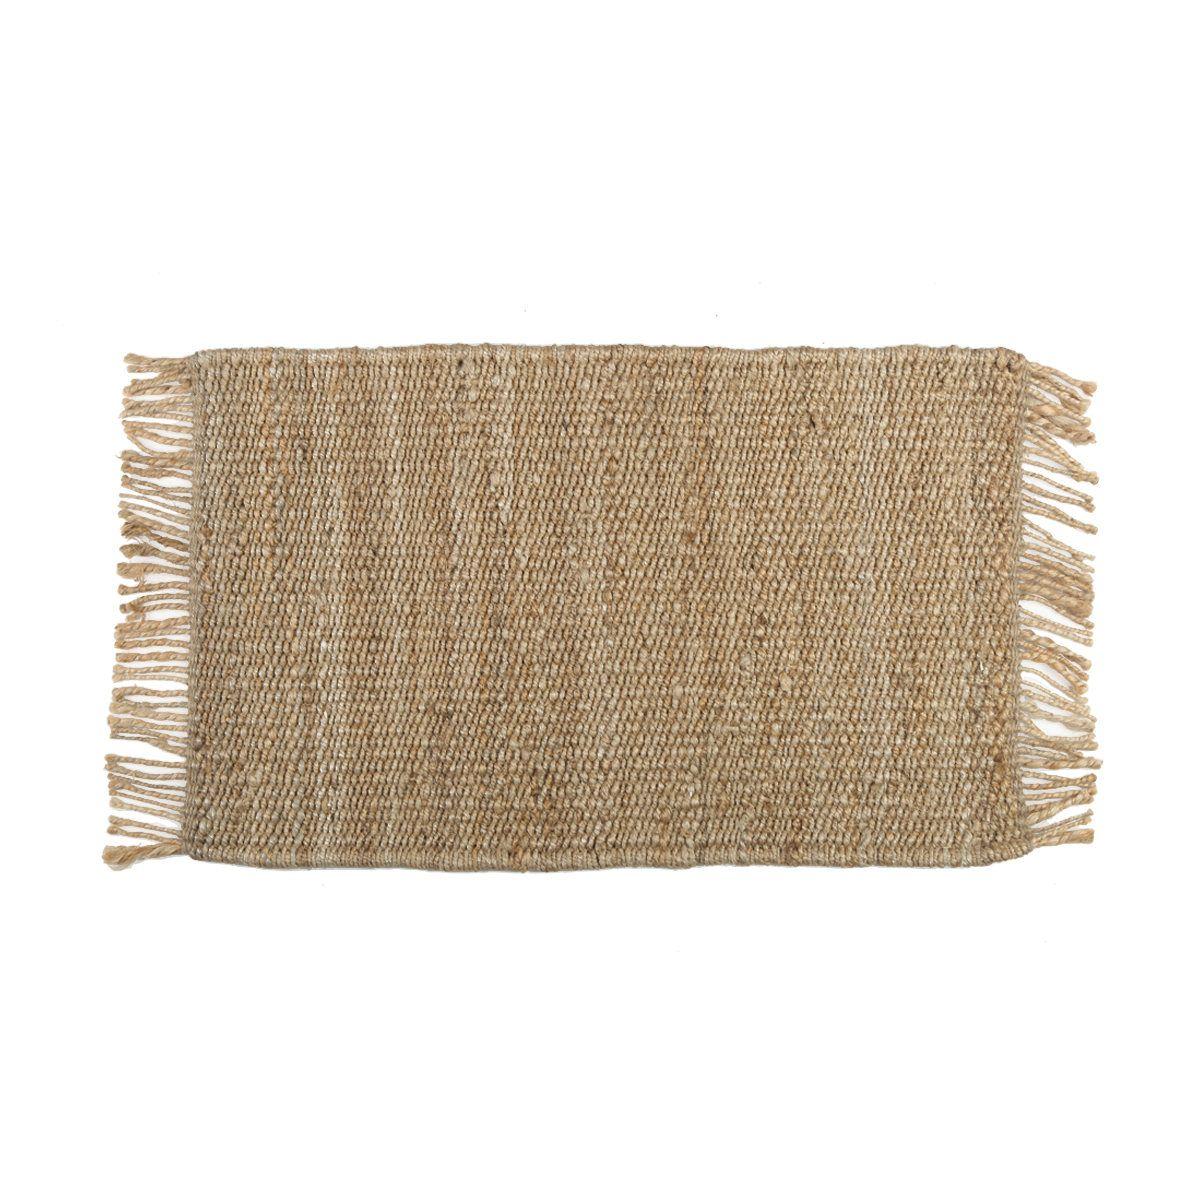 Jute Weave Mat Natural Kmartnz Jute Mats Decorative Accessories Jute